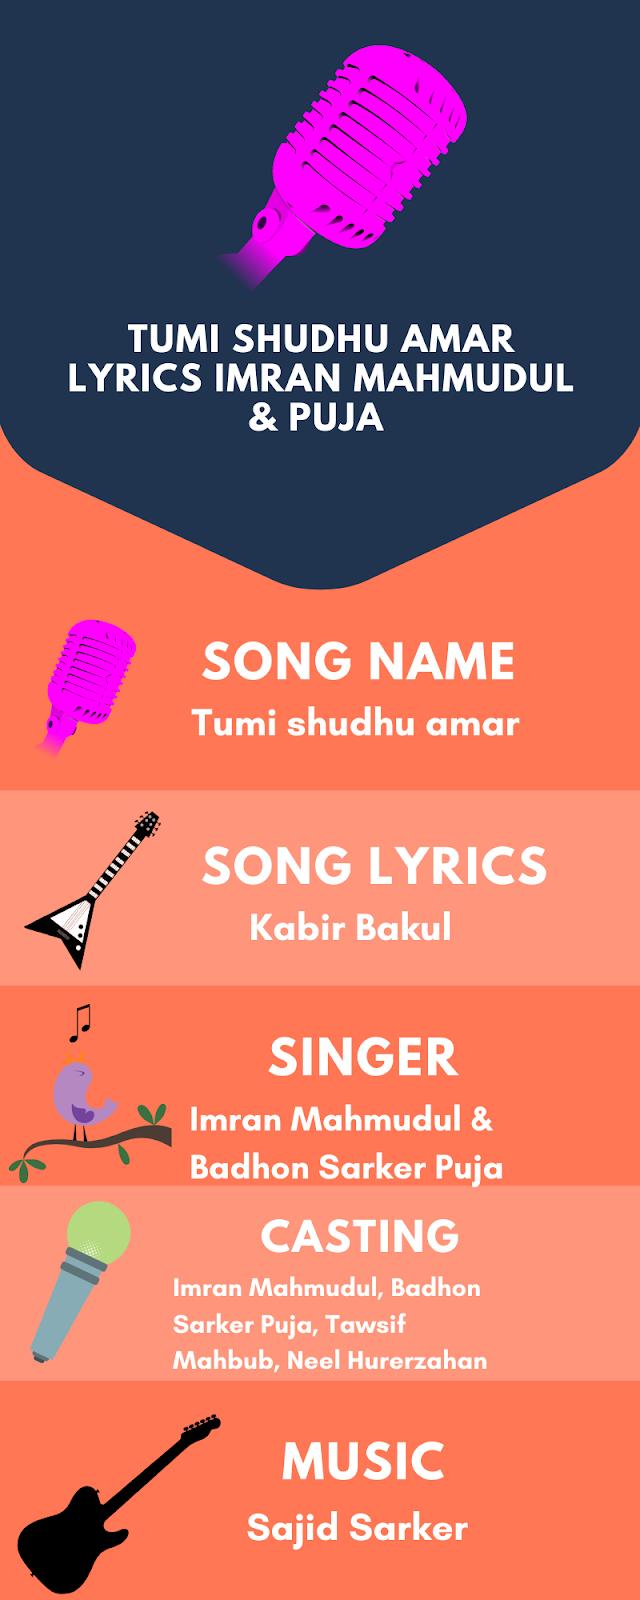 Tumi shudhu amar lyrics Imran Mahmudul & Puja